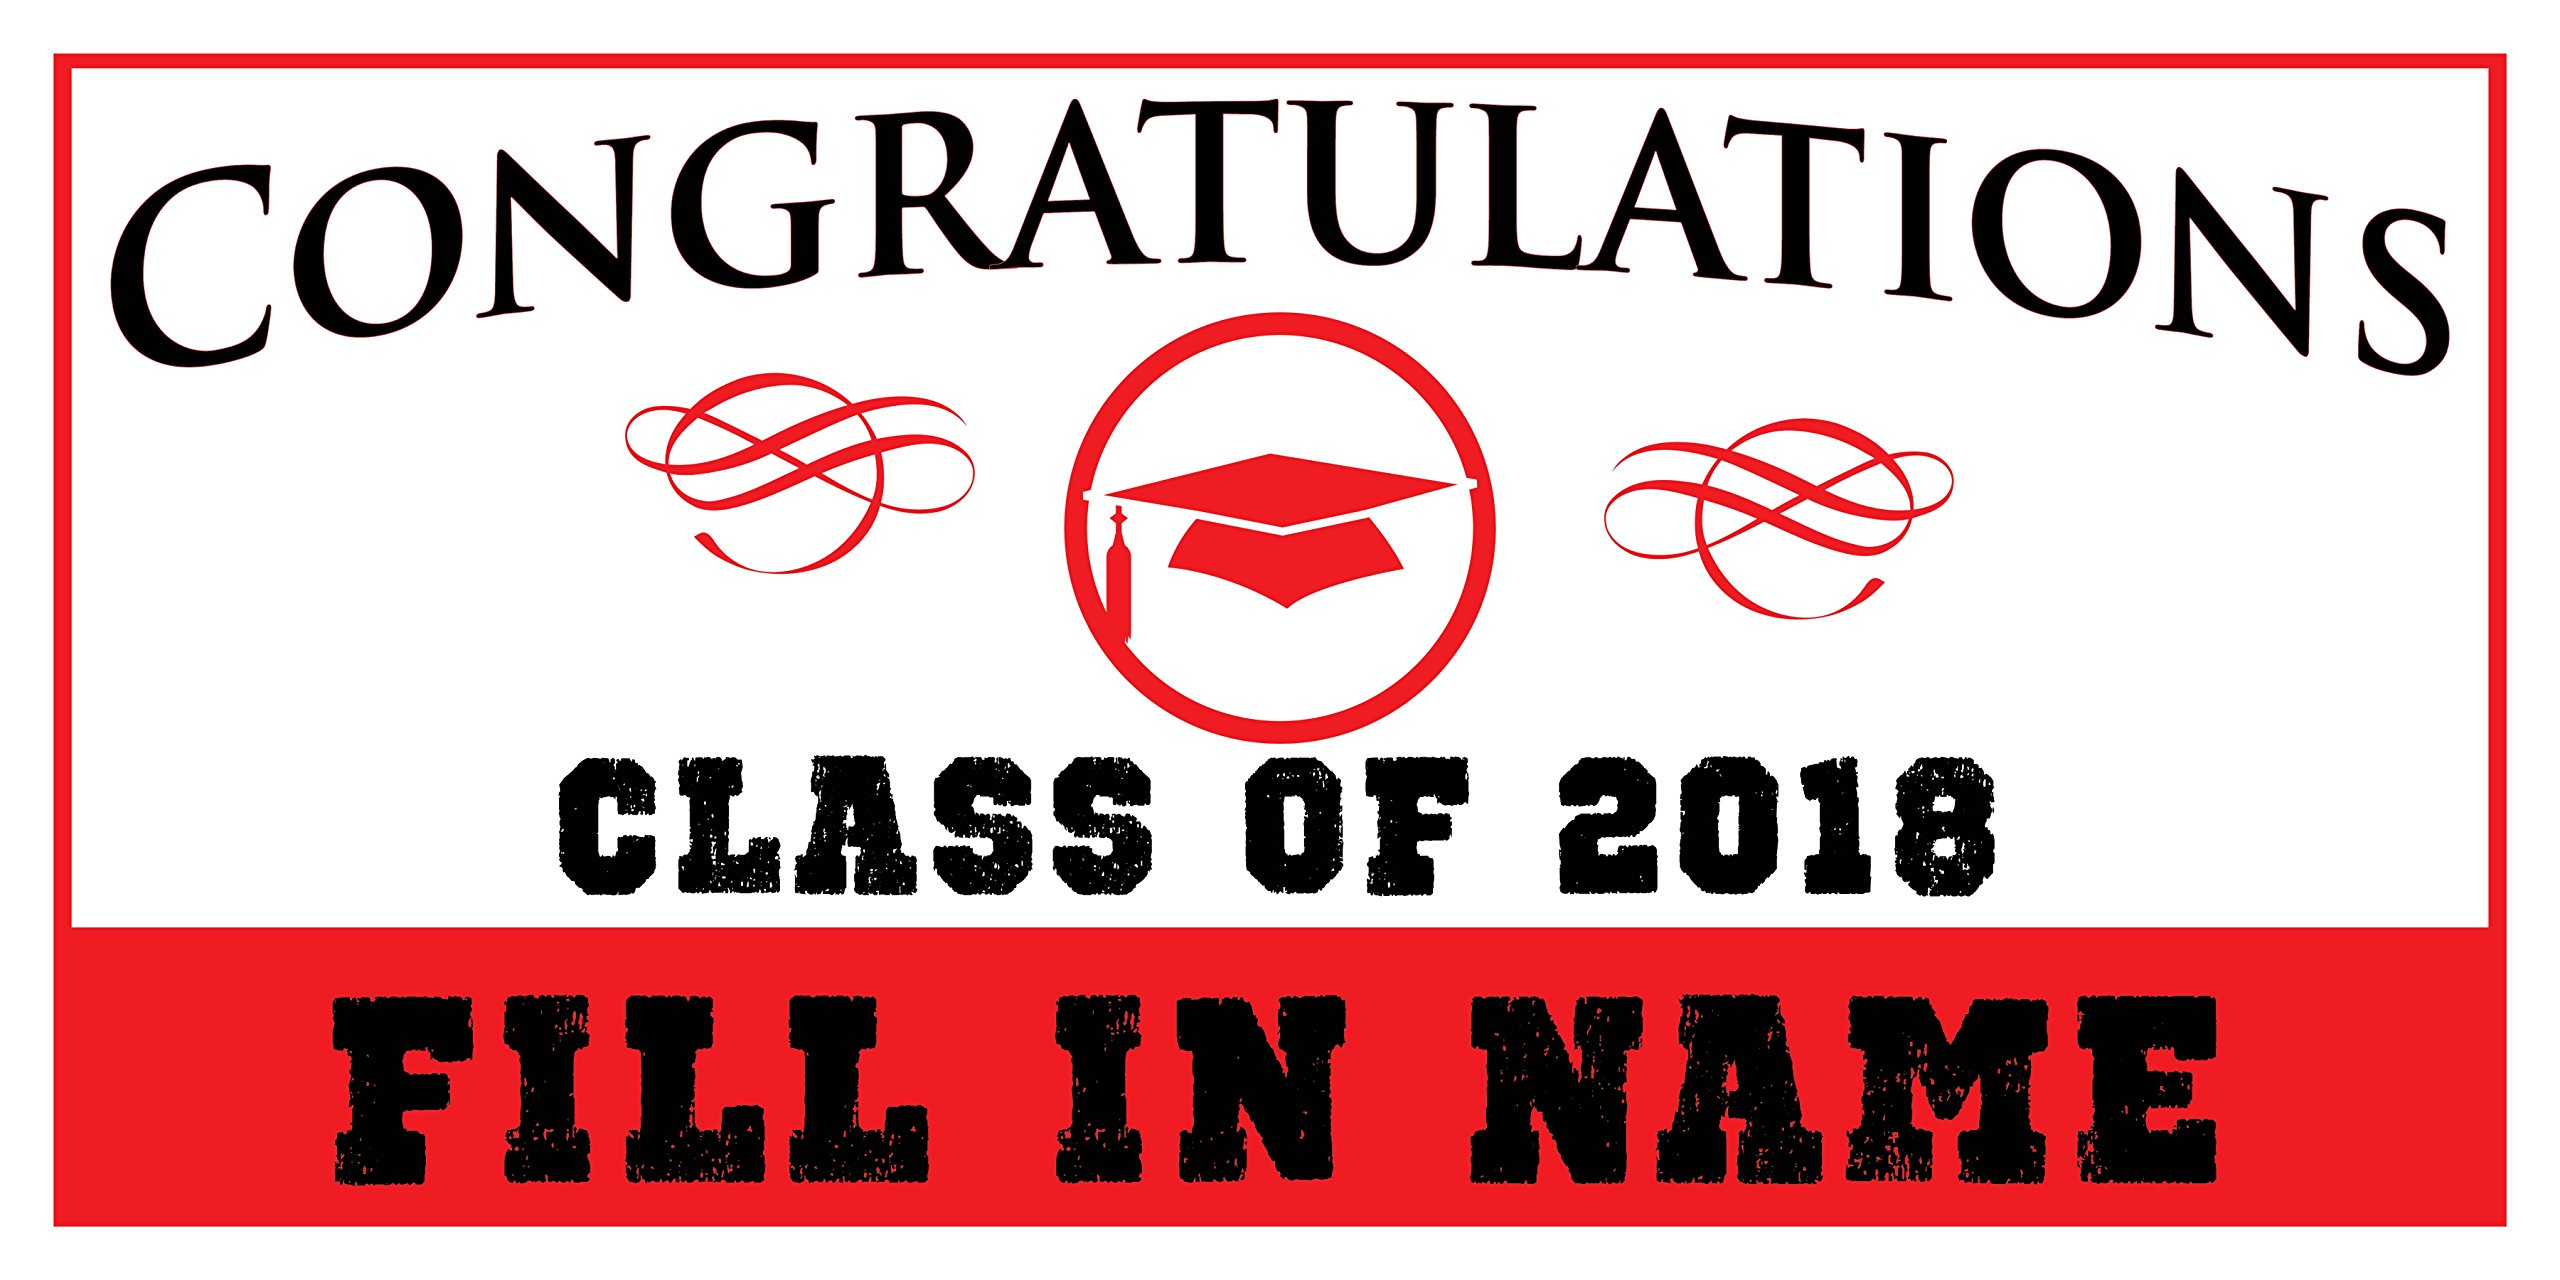 Custom Printed Graduation Banner Congratulations - Hat Red (10' x 5')